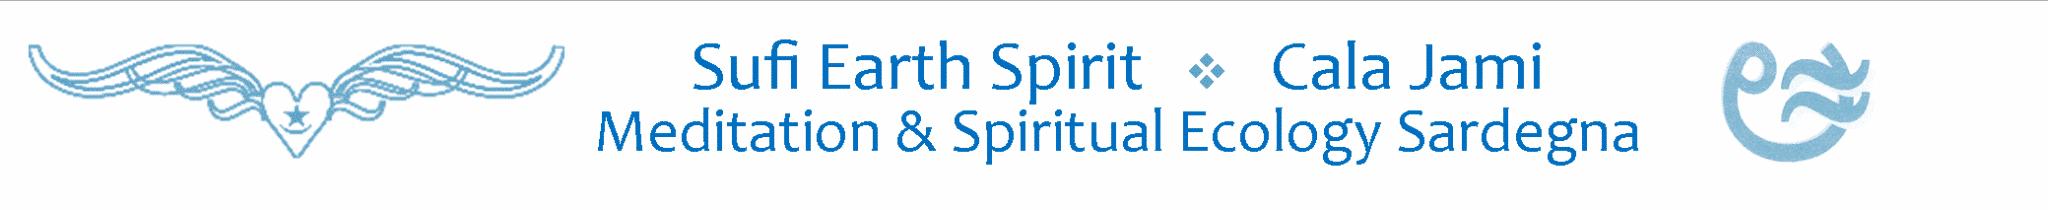 Sufi Sardegna Retina Logo